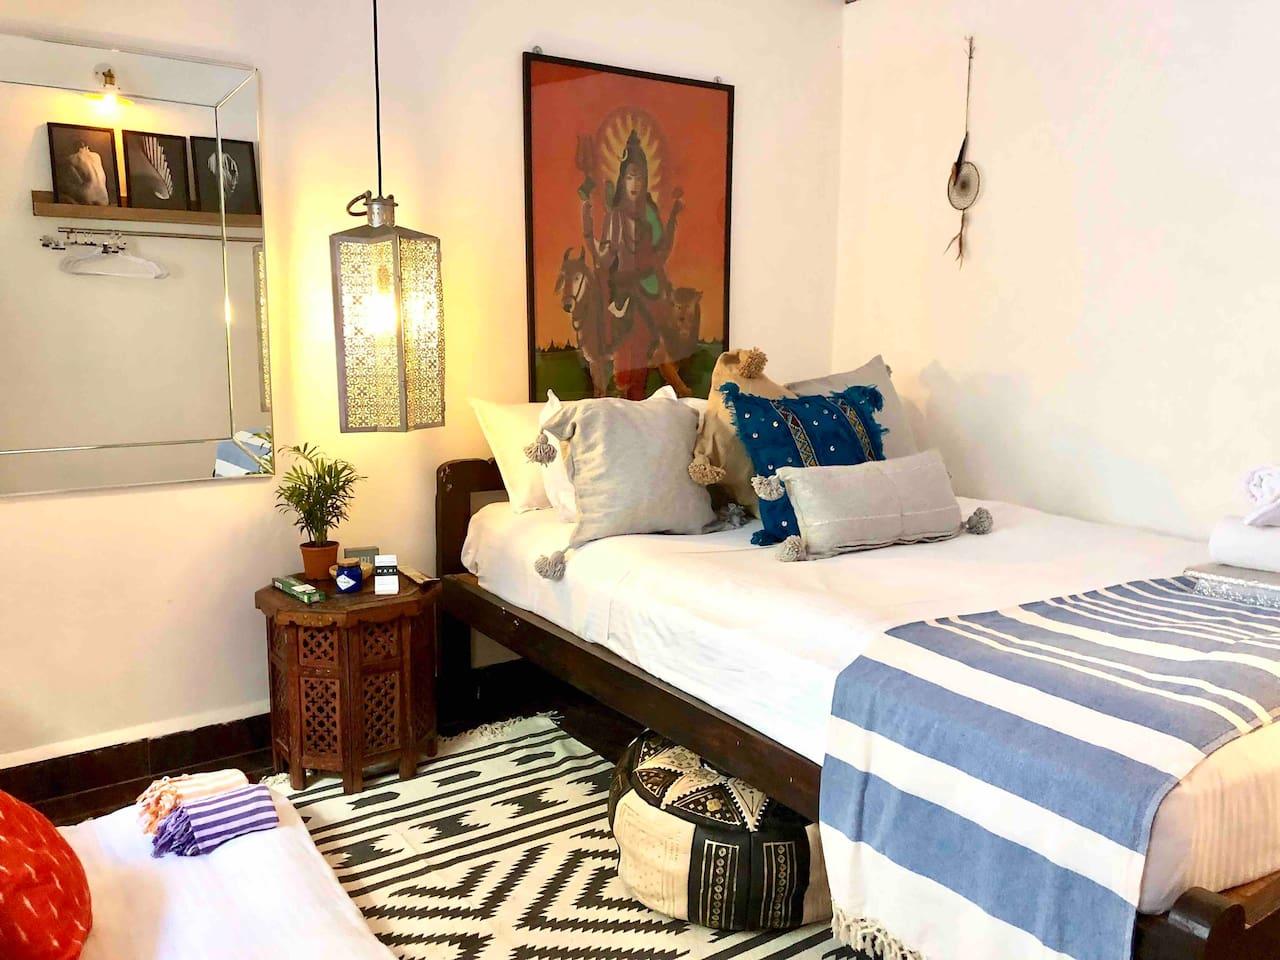 The Shiva Room